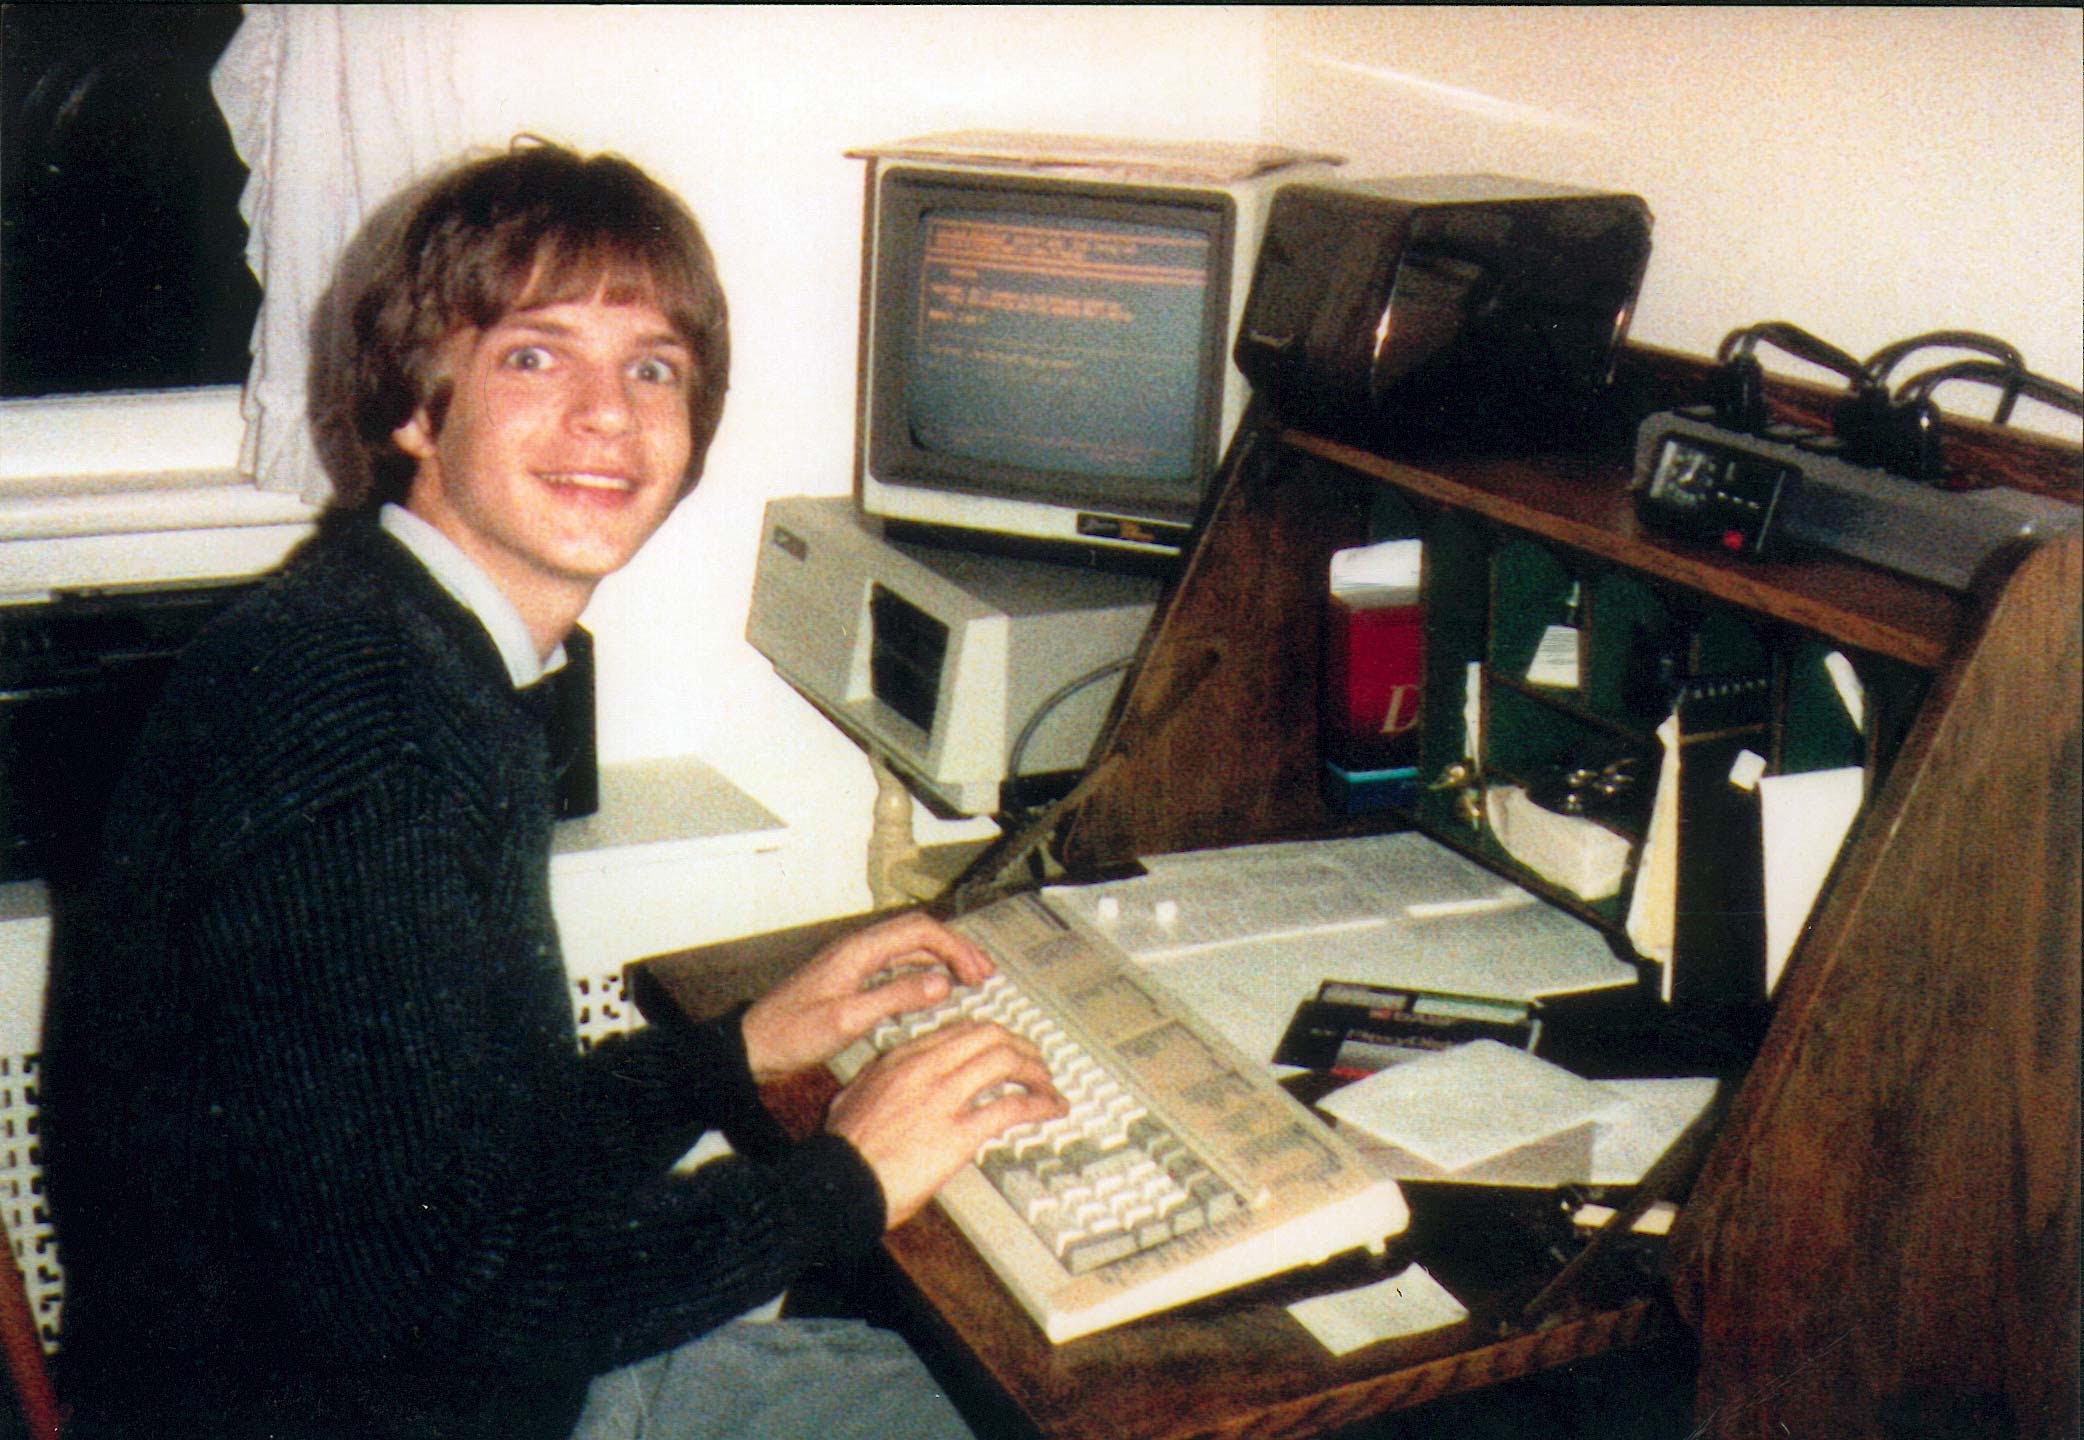 Andrew at Hoist Age